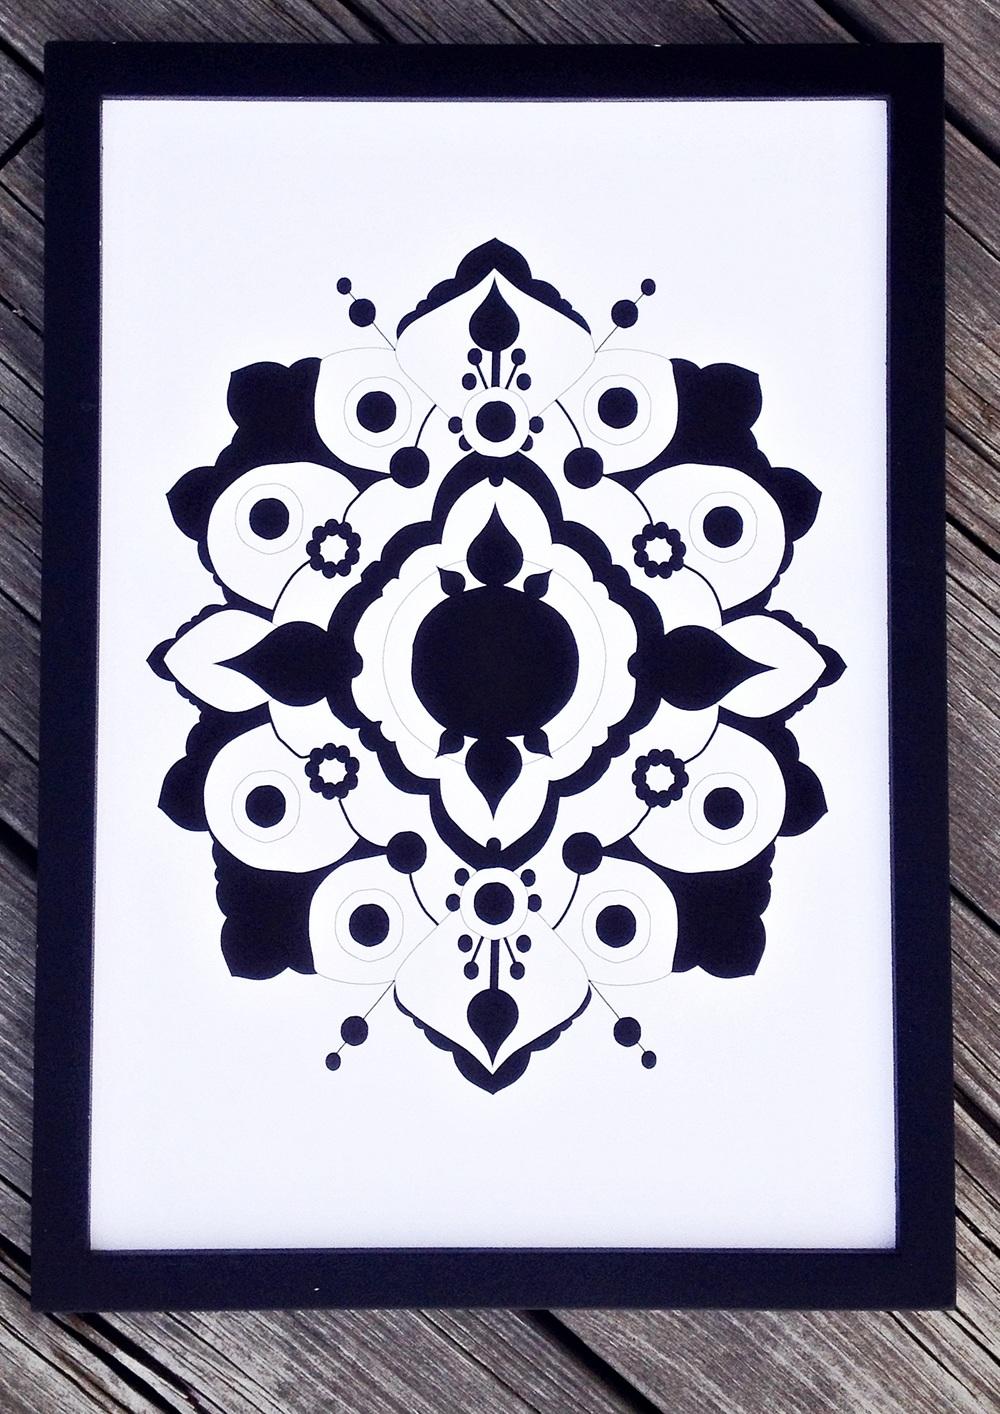 Akantus grafiskt design print millandante.se